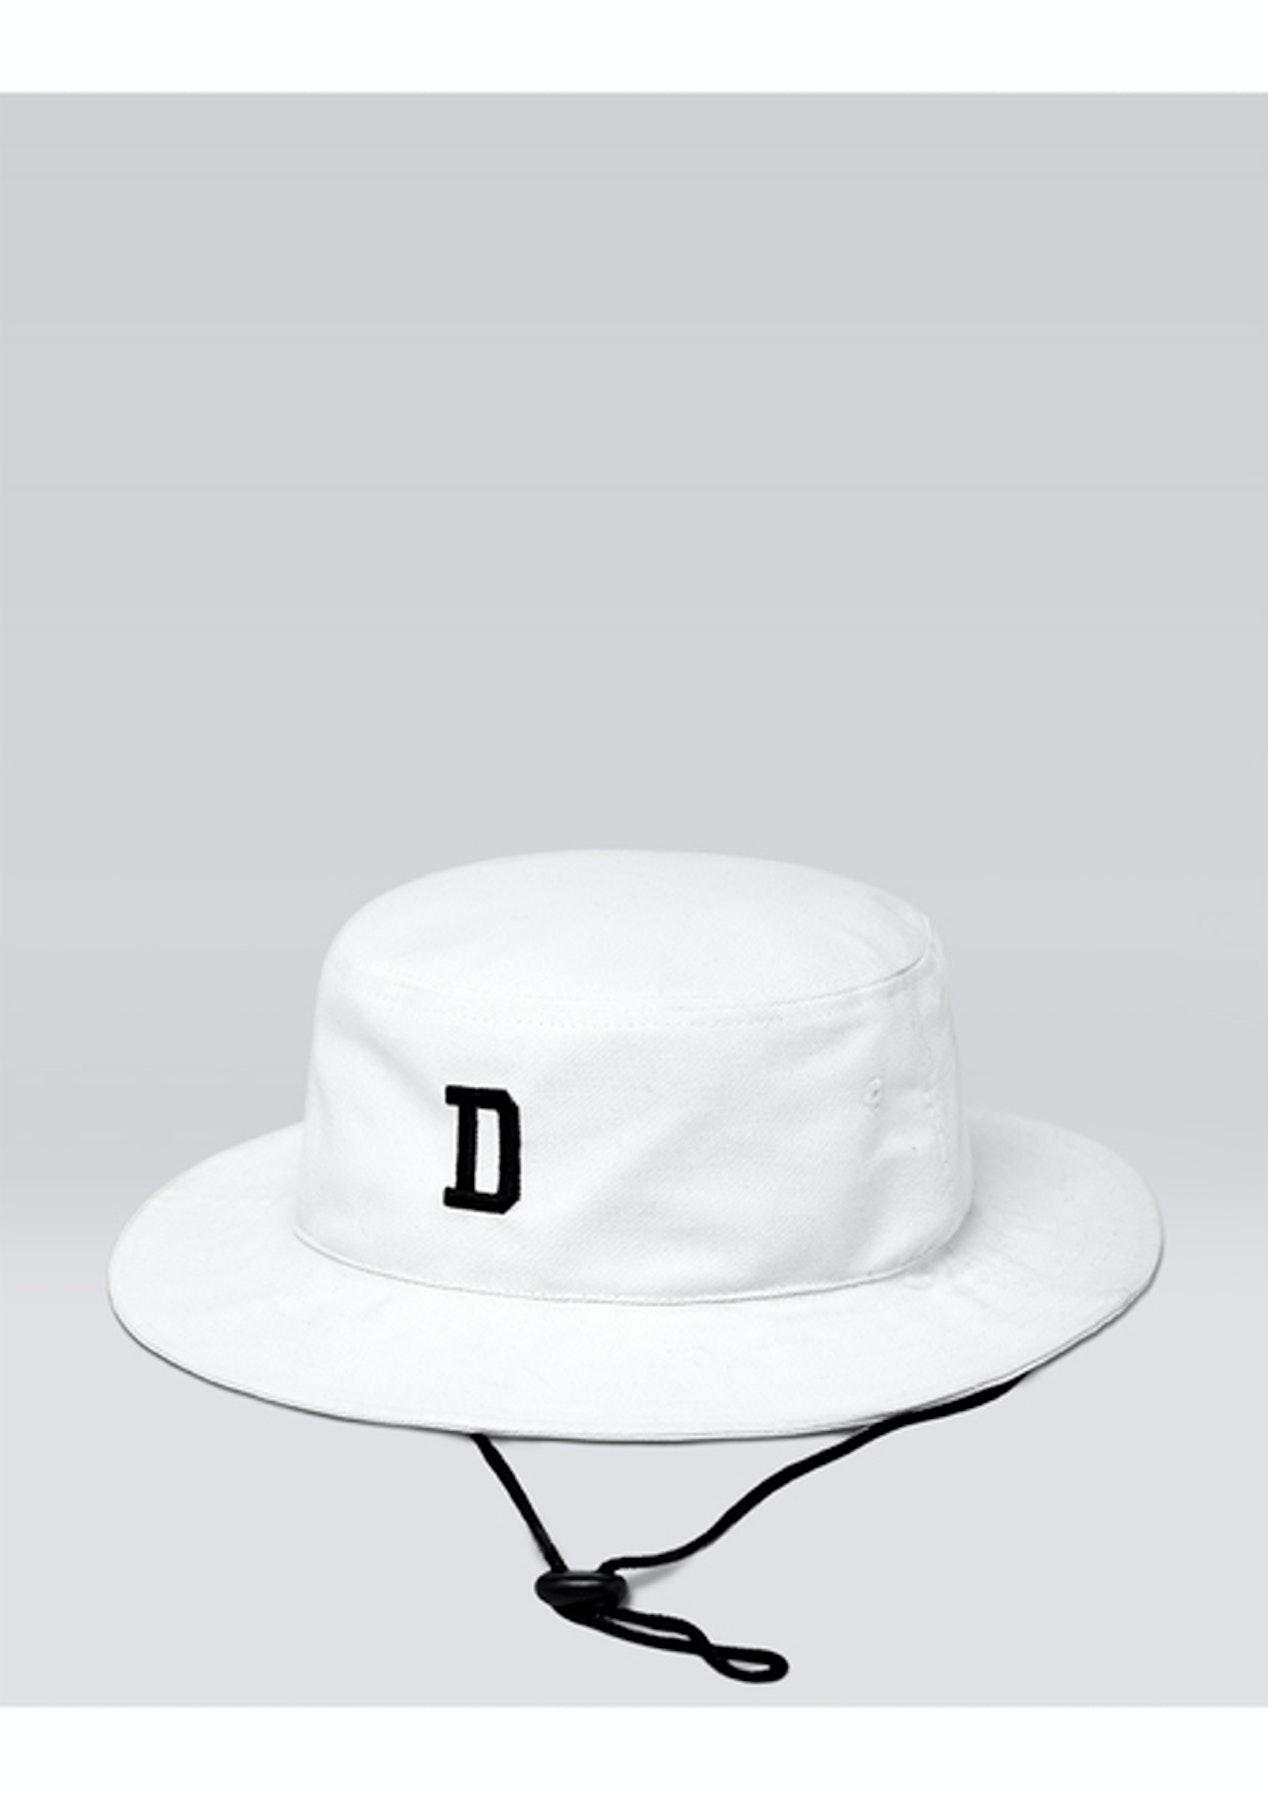 DSCRT - Safari Bucket Hat - White - Men s Streetwear Sale - Onceit 37bb248b8b3